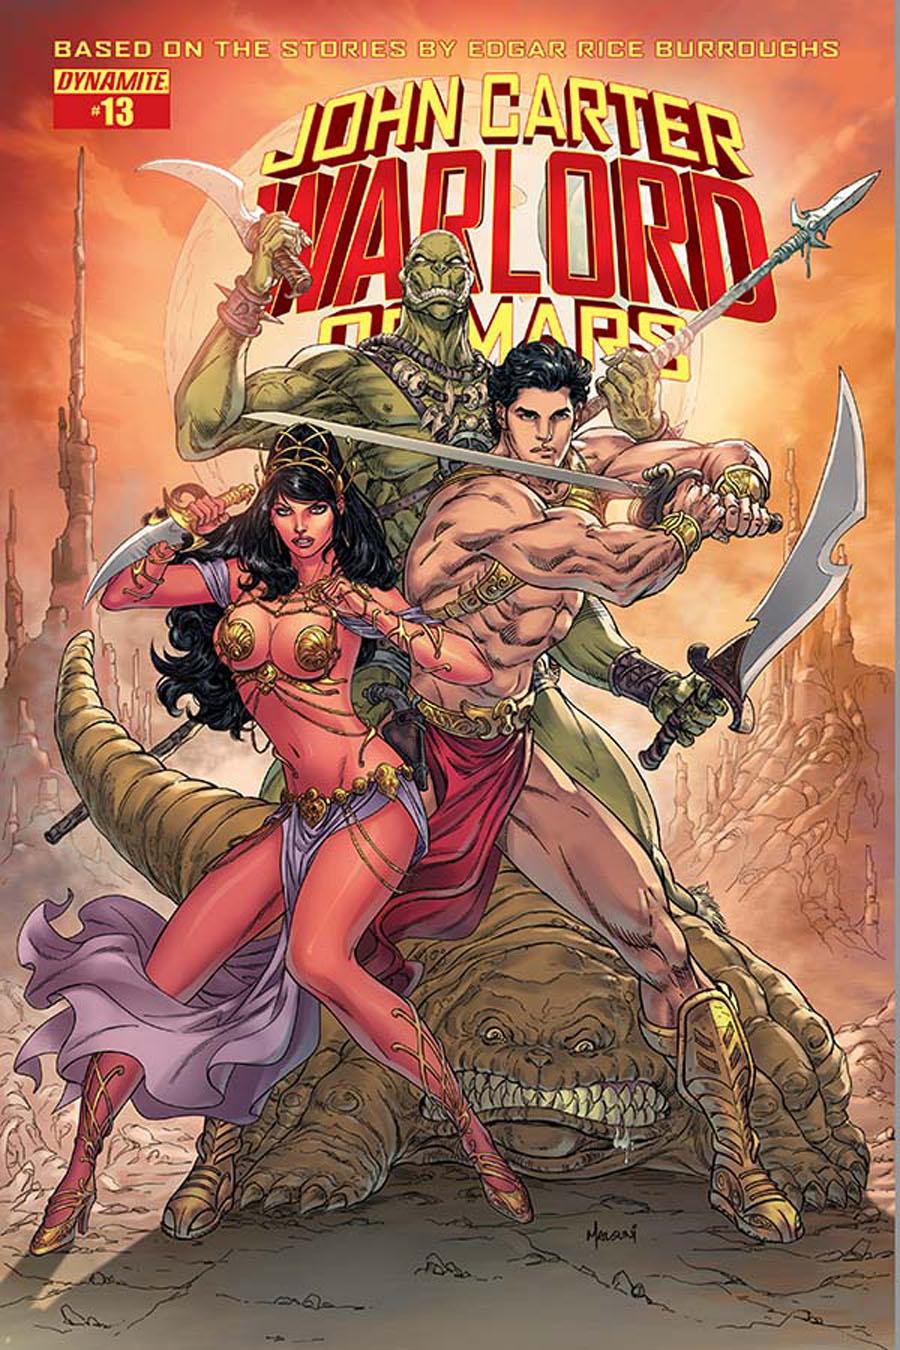 John Carter Warlord Of Mars Vol 2 #13 Cover B Variant Abhishek Malsuni Cover